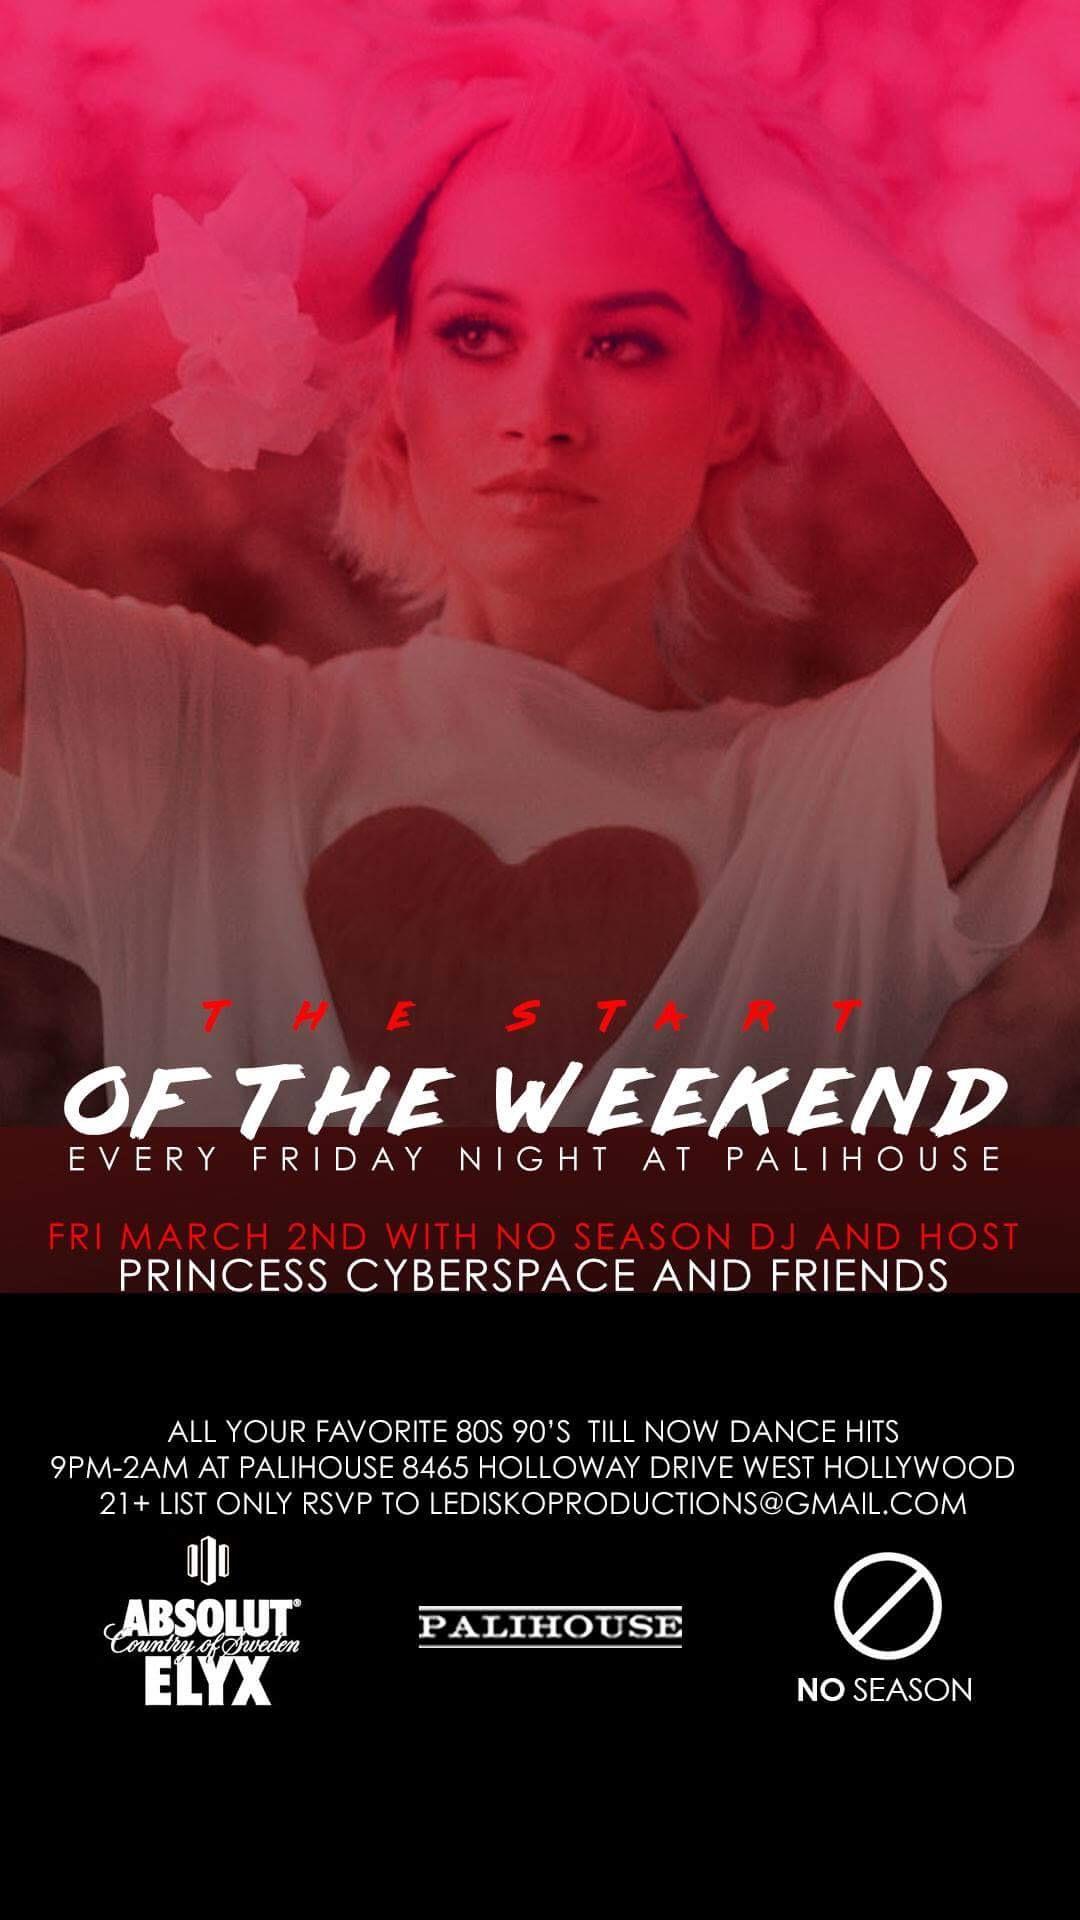 Princess Cyberspace Palihouse West Hollywood